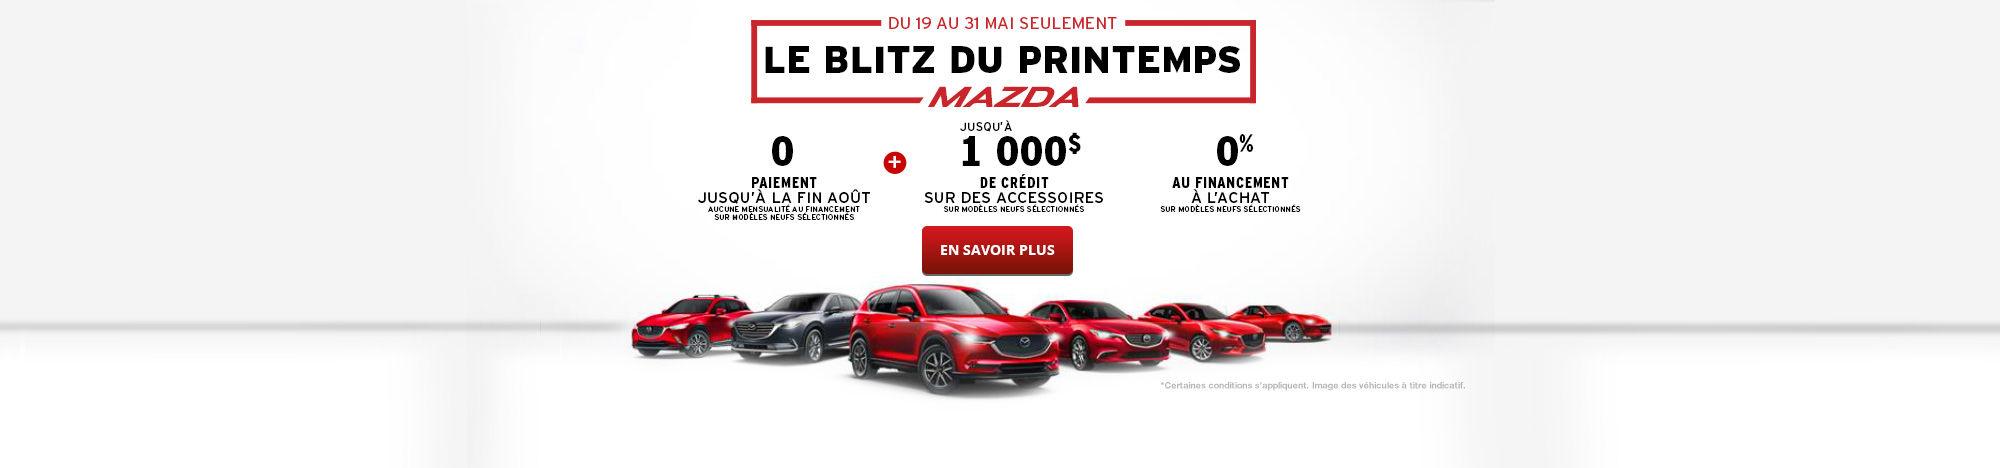 L'événement Passez en mode printemps Mazda - Mai -